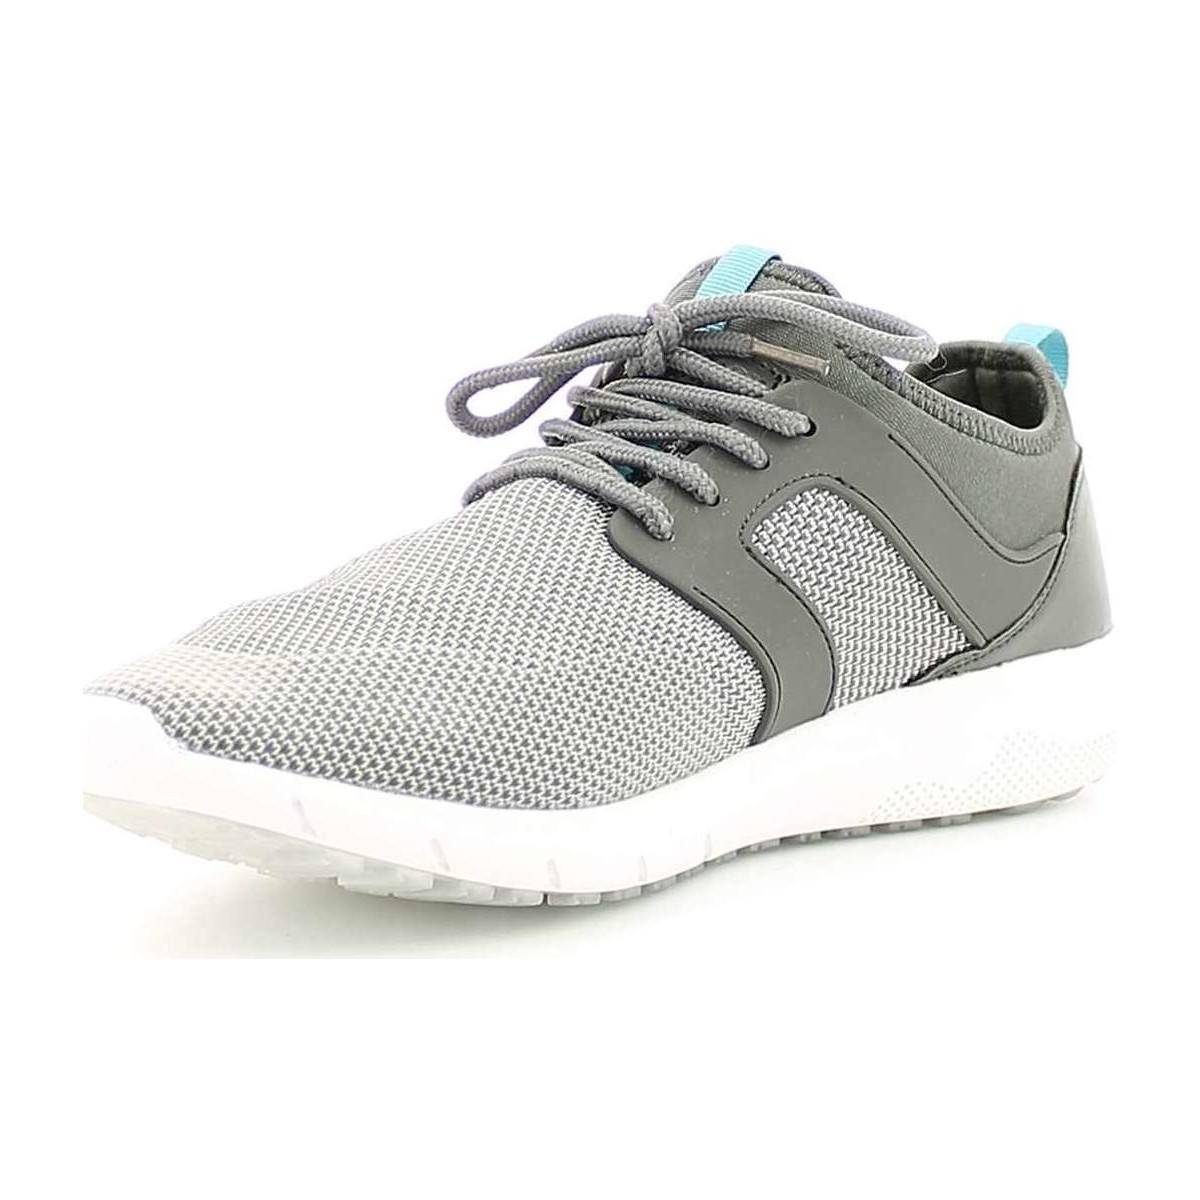 Lumberjack Sm25005 001 P39 Sneakers Man Grey Men's Shoes (trainers) In Grey in Grey for Men